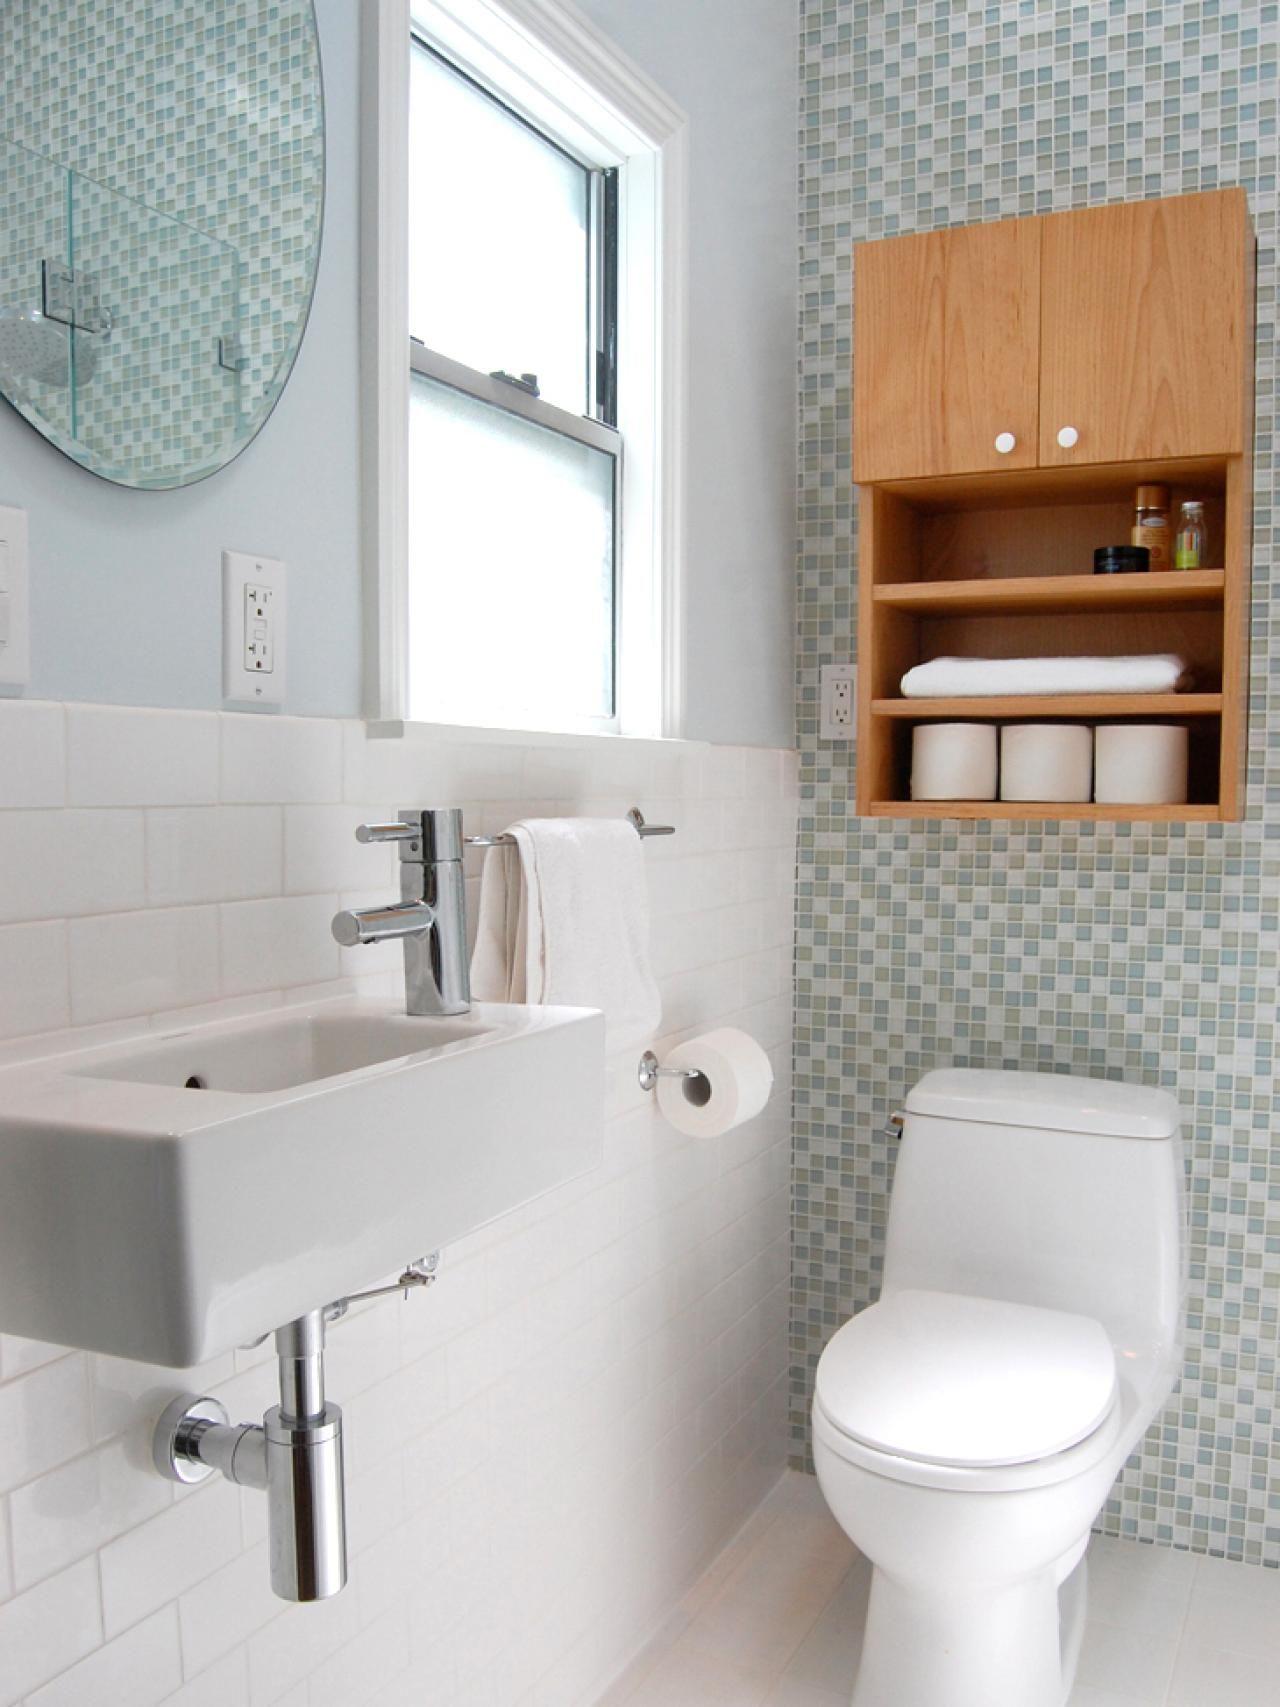 small bathroom design ideas  designs hgtv white also best images home decor rh pinterest